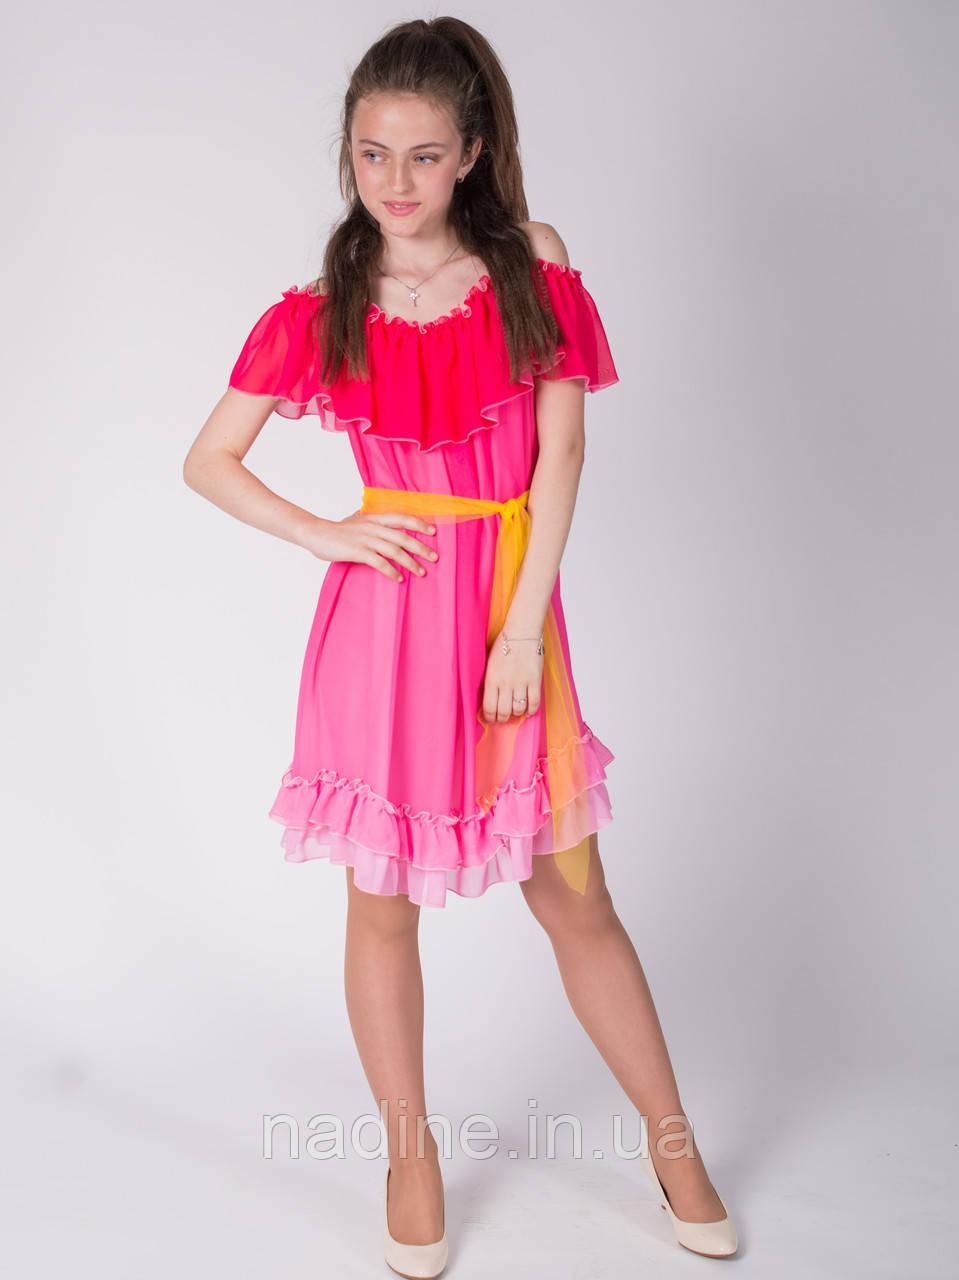 Шифоновое платье Nadine, Bright Alstrmeria 158, ярко розовое